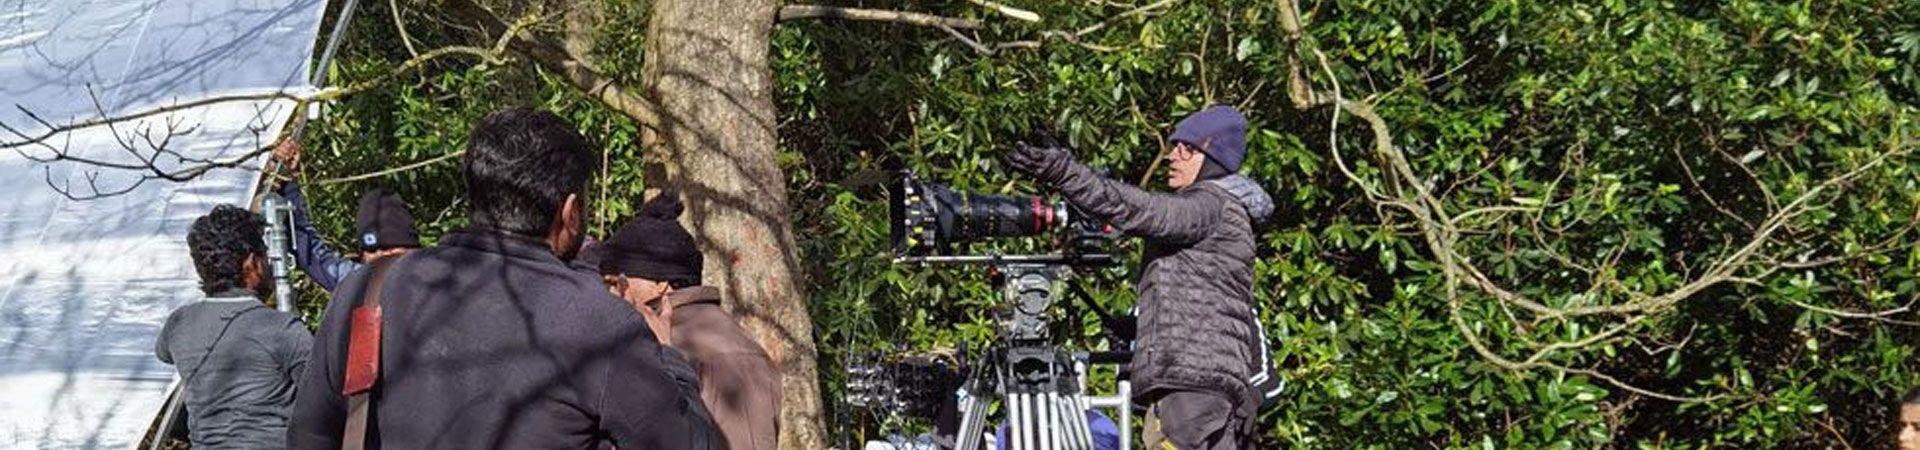 location filming